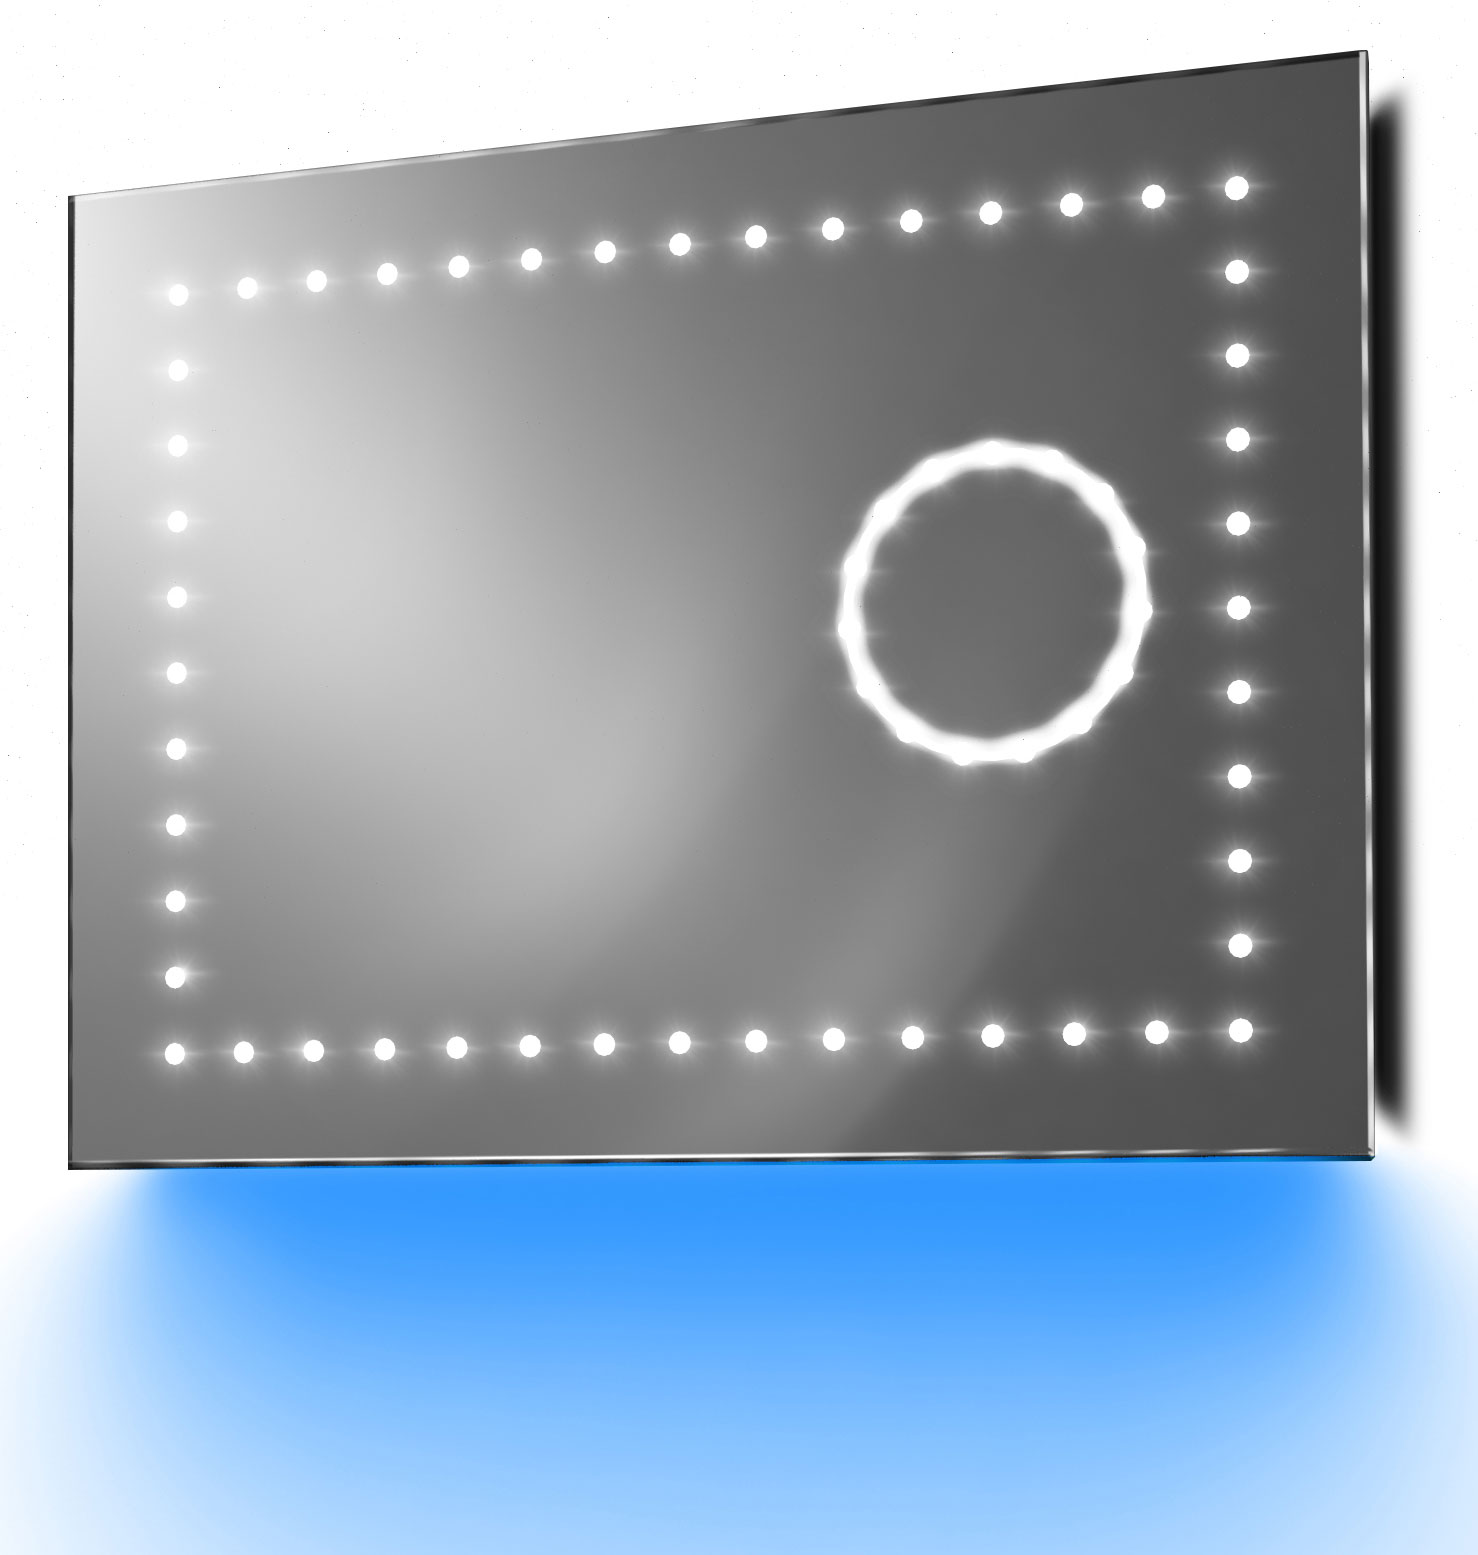 miroir grossissant slimline r trolumineux ambiant anti bu e capteur k100b ebay. Black Bedroom Furniture Sets. Home Design Ideas